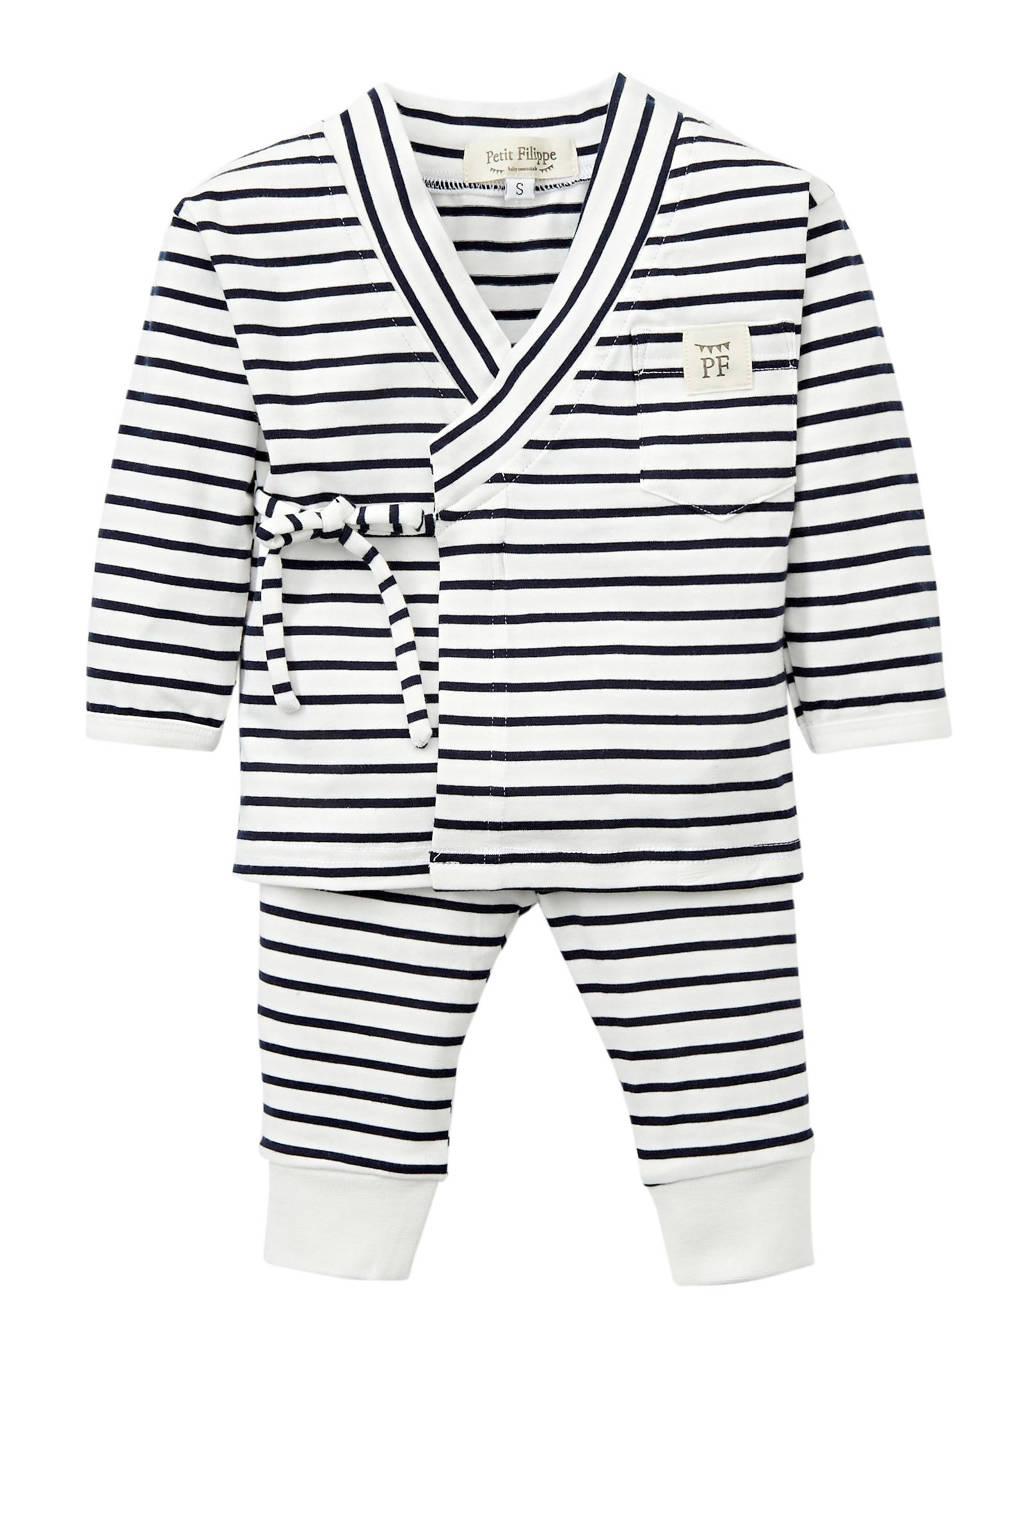 Petit Filippe baby overslag longsleeve + broek Breton Stripes wit/donkerblauw, Donkerblauw/wit